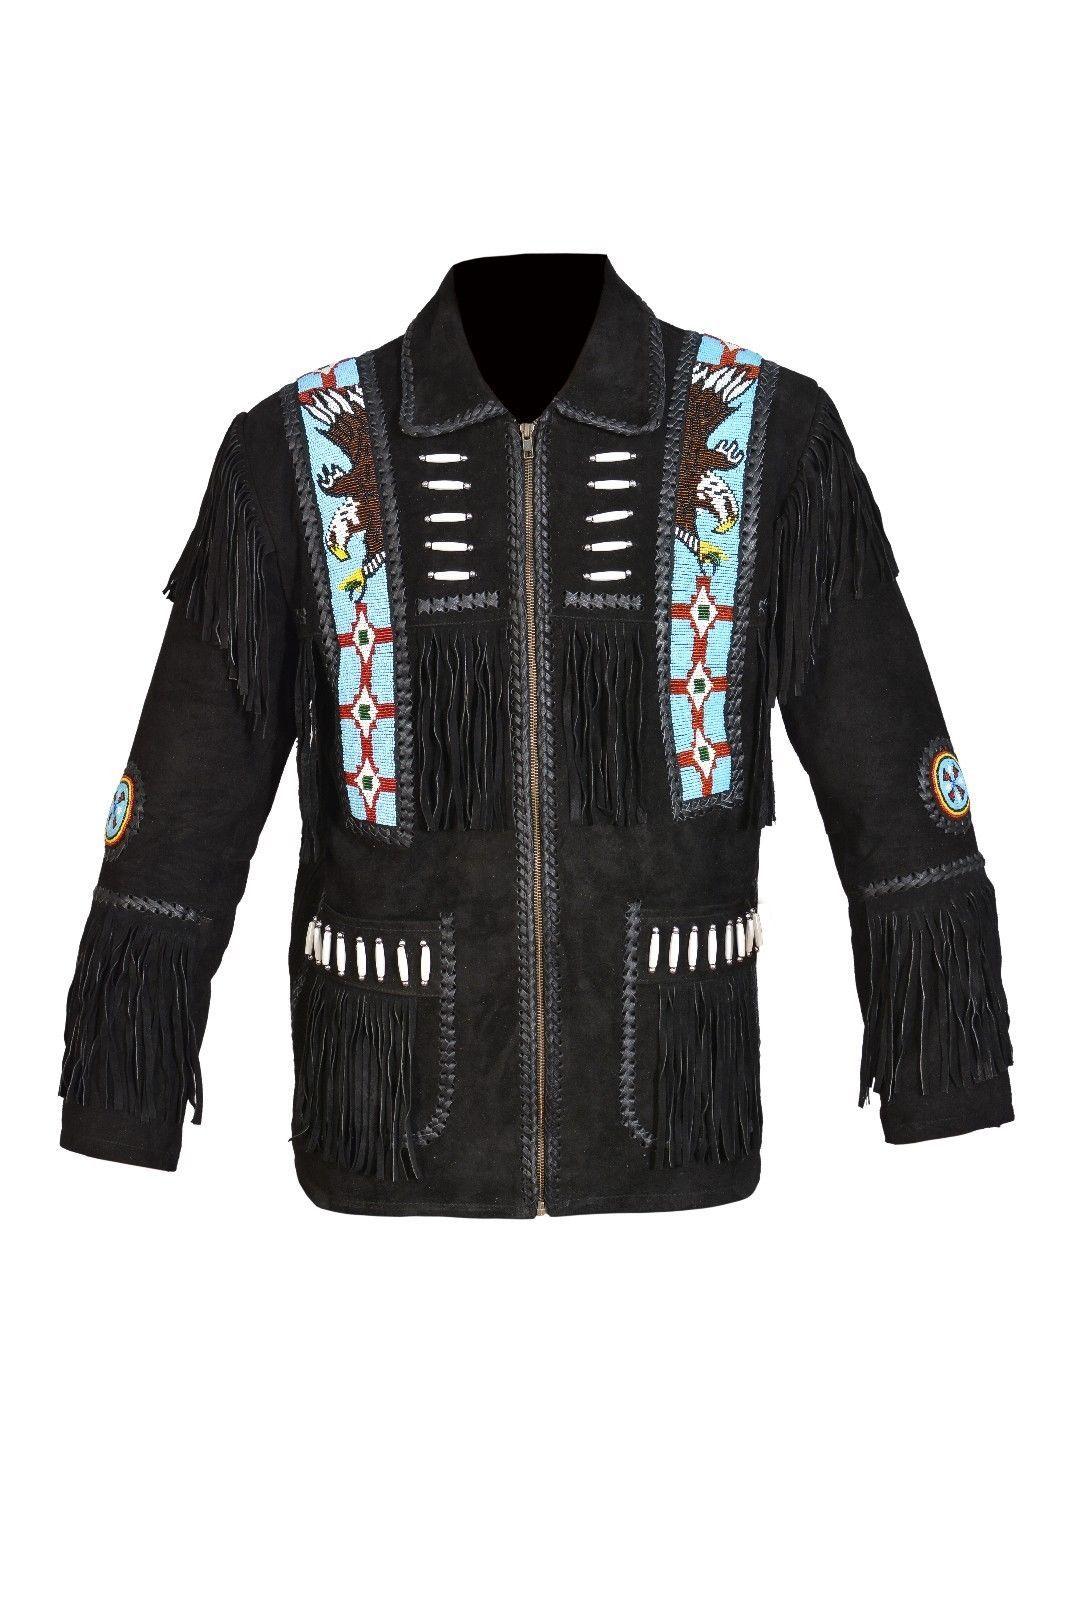 Men New Native American Buckskin Black Goat Suede Leather Bead Shirt & Pant WS69 image 3